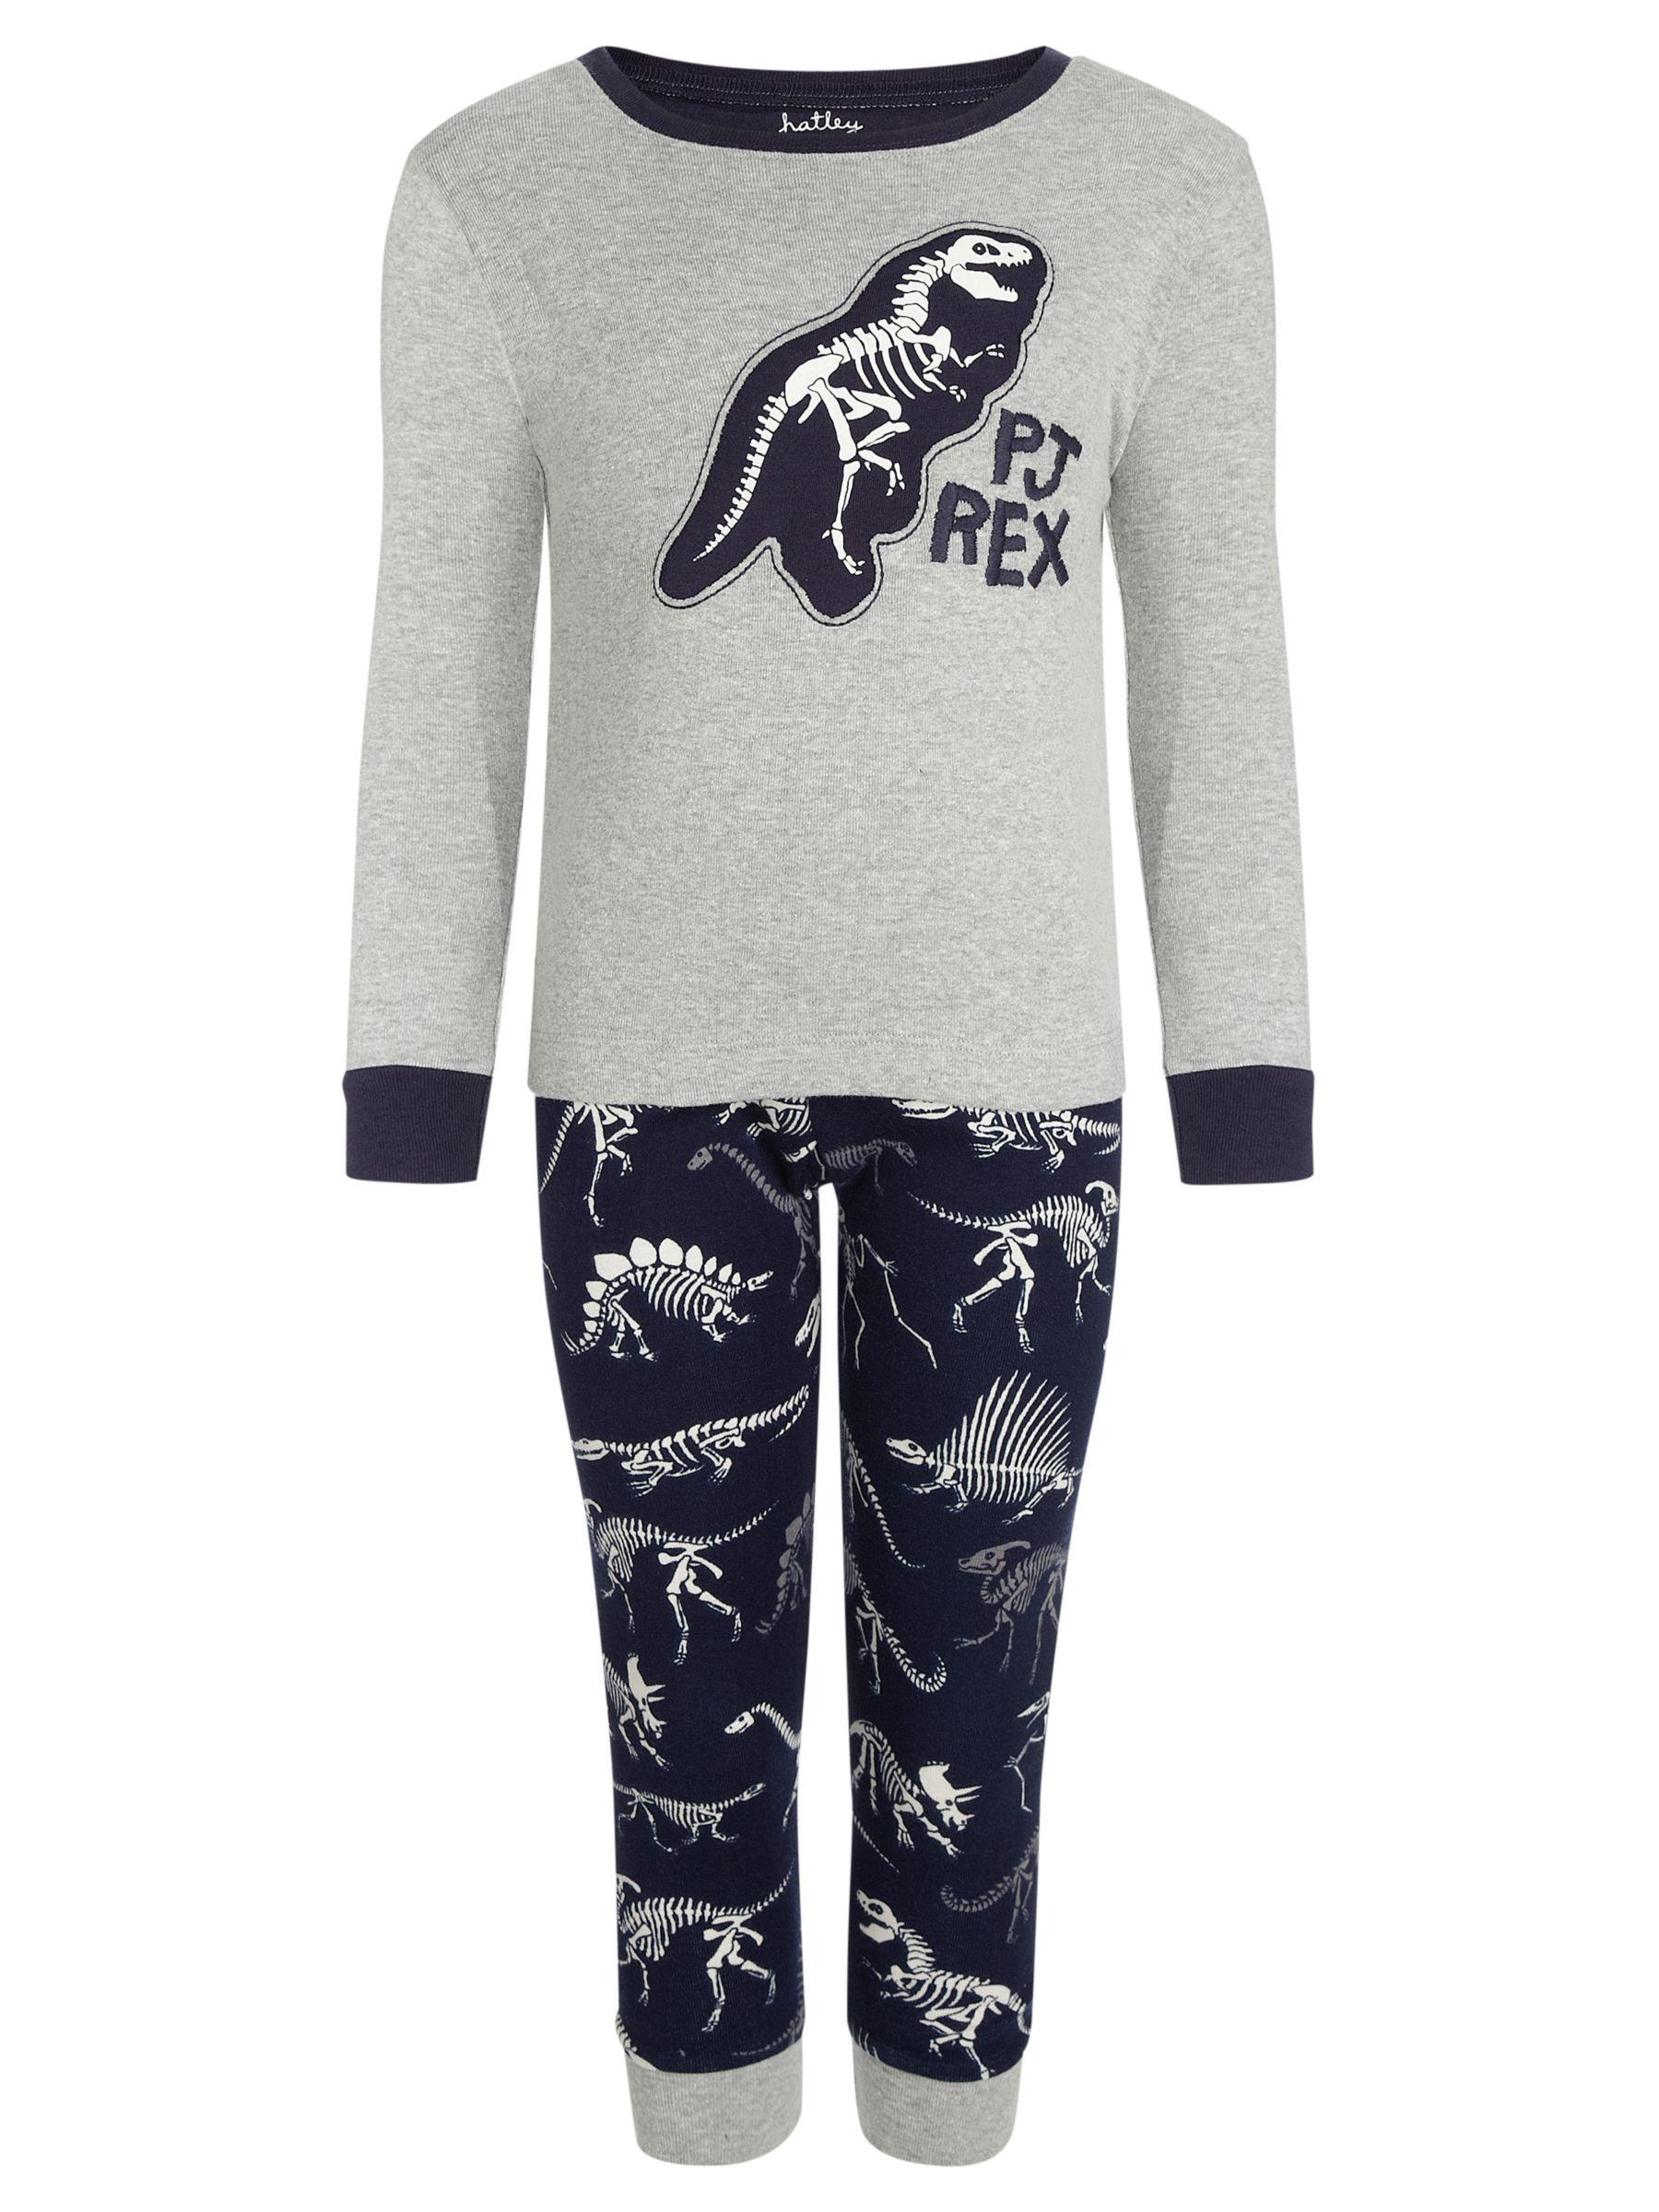 Hatley Dinosaur PJ Rex Pyjamas, Navy/Grey